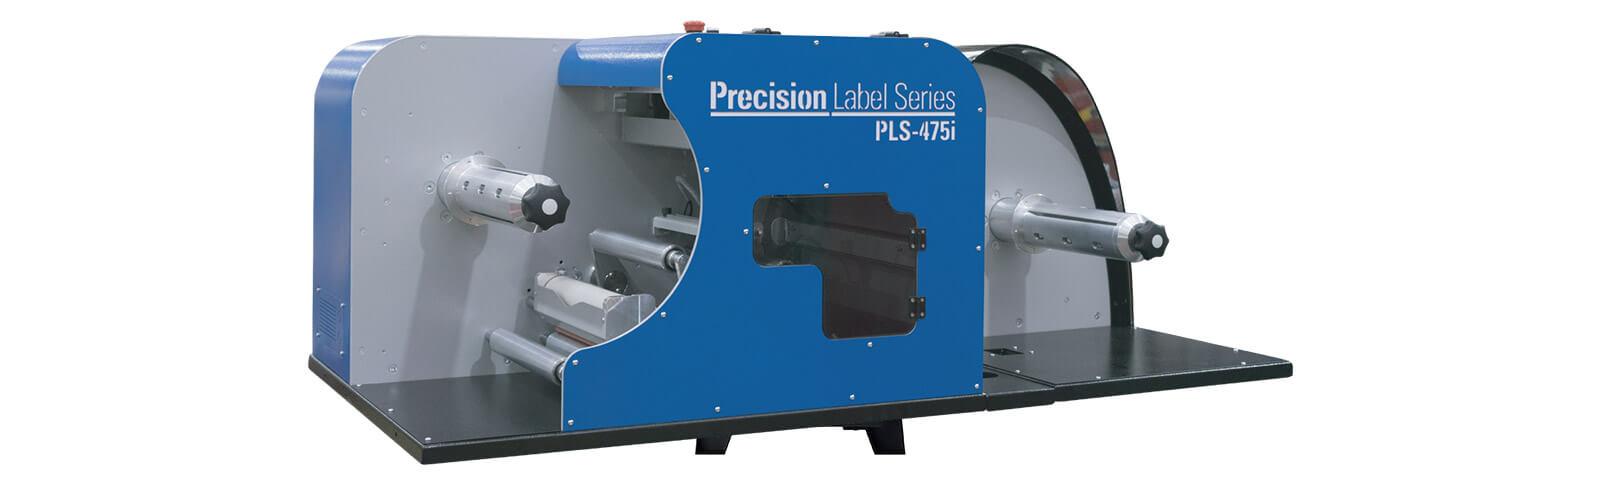 Precision Label-Series PLS-475i